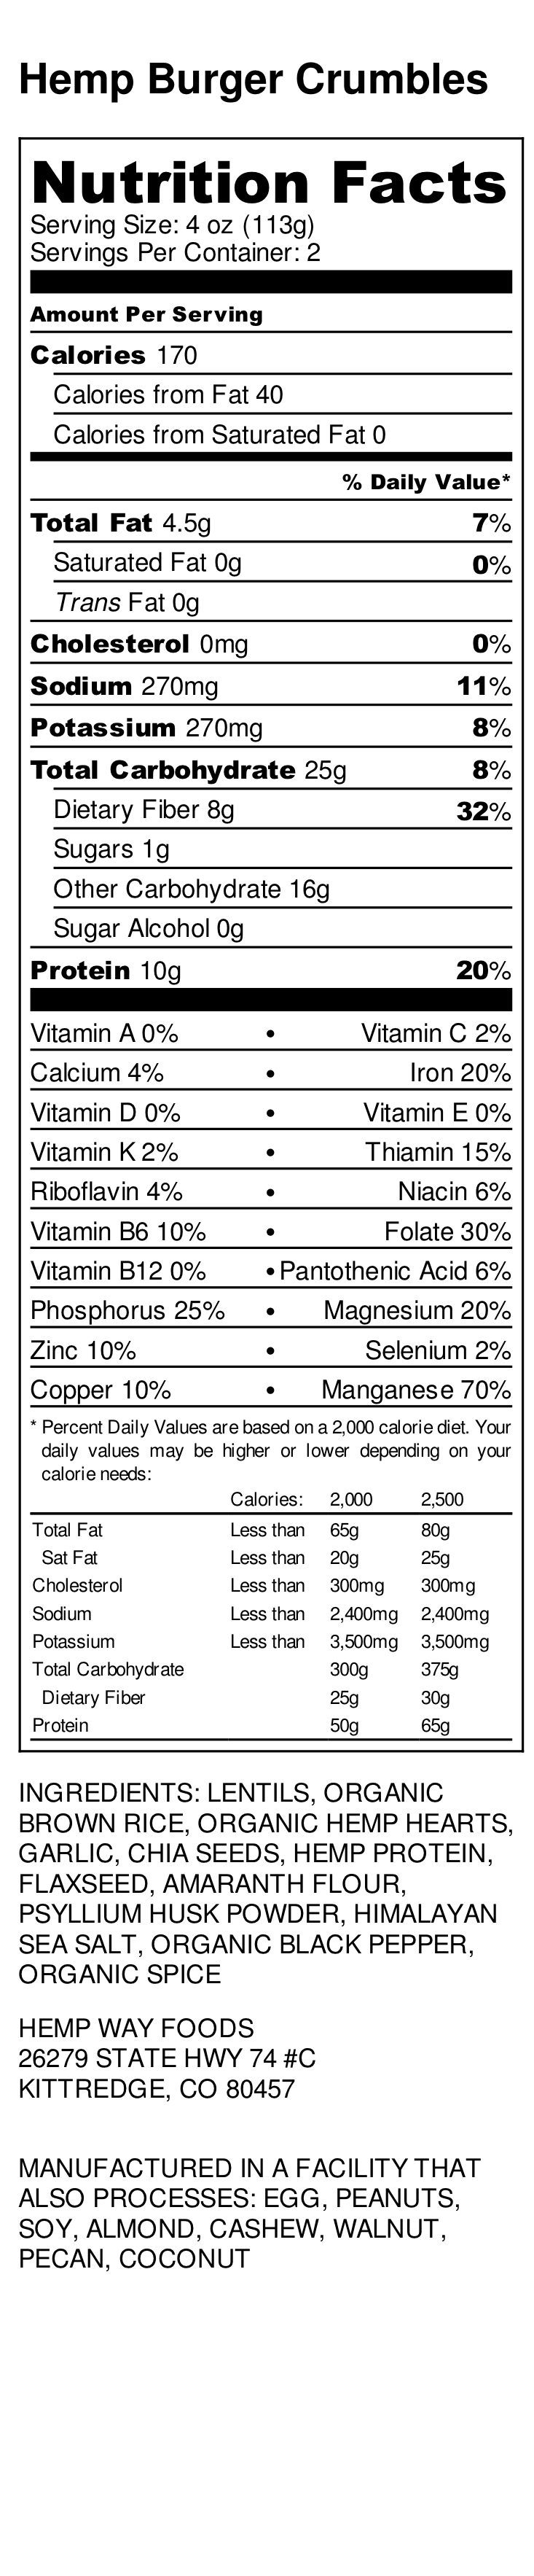 Hemp Burger Crumbles   - Nutrition Label.png